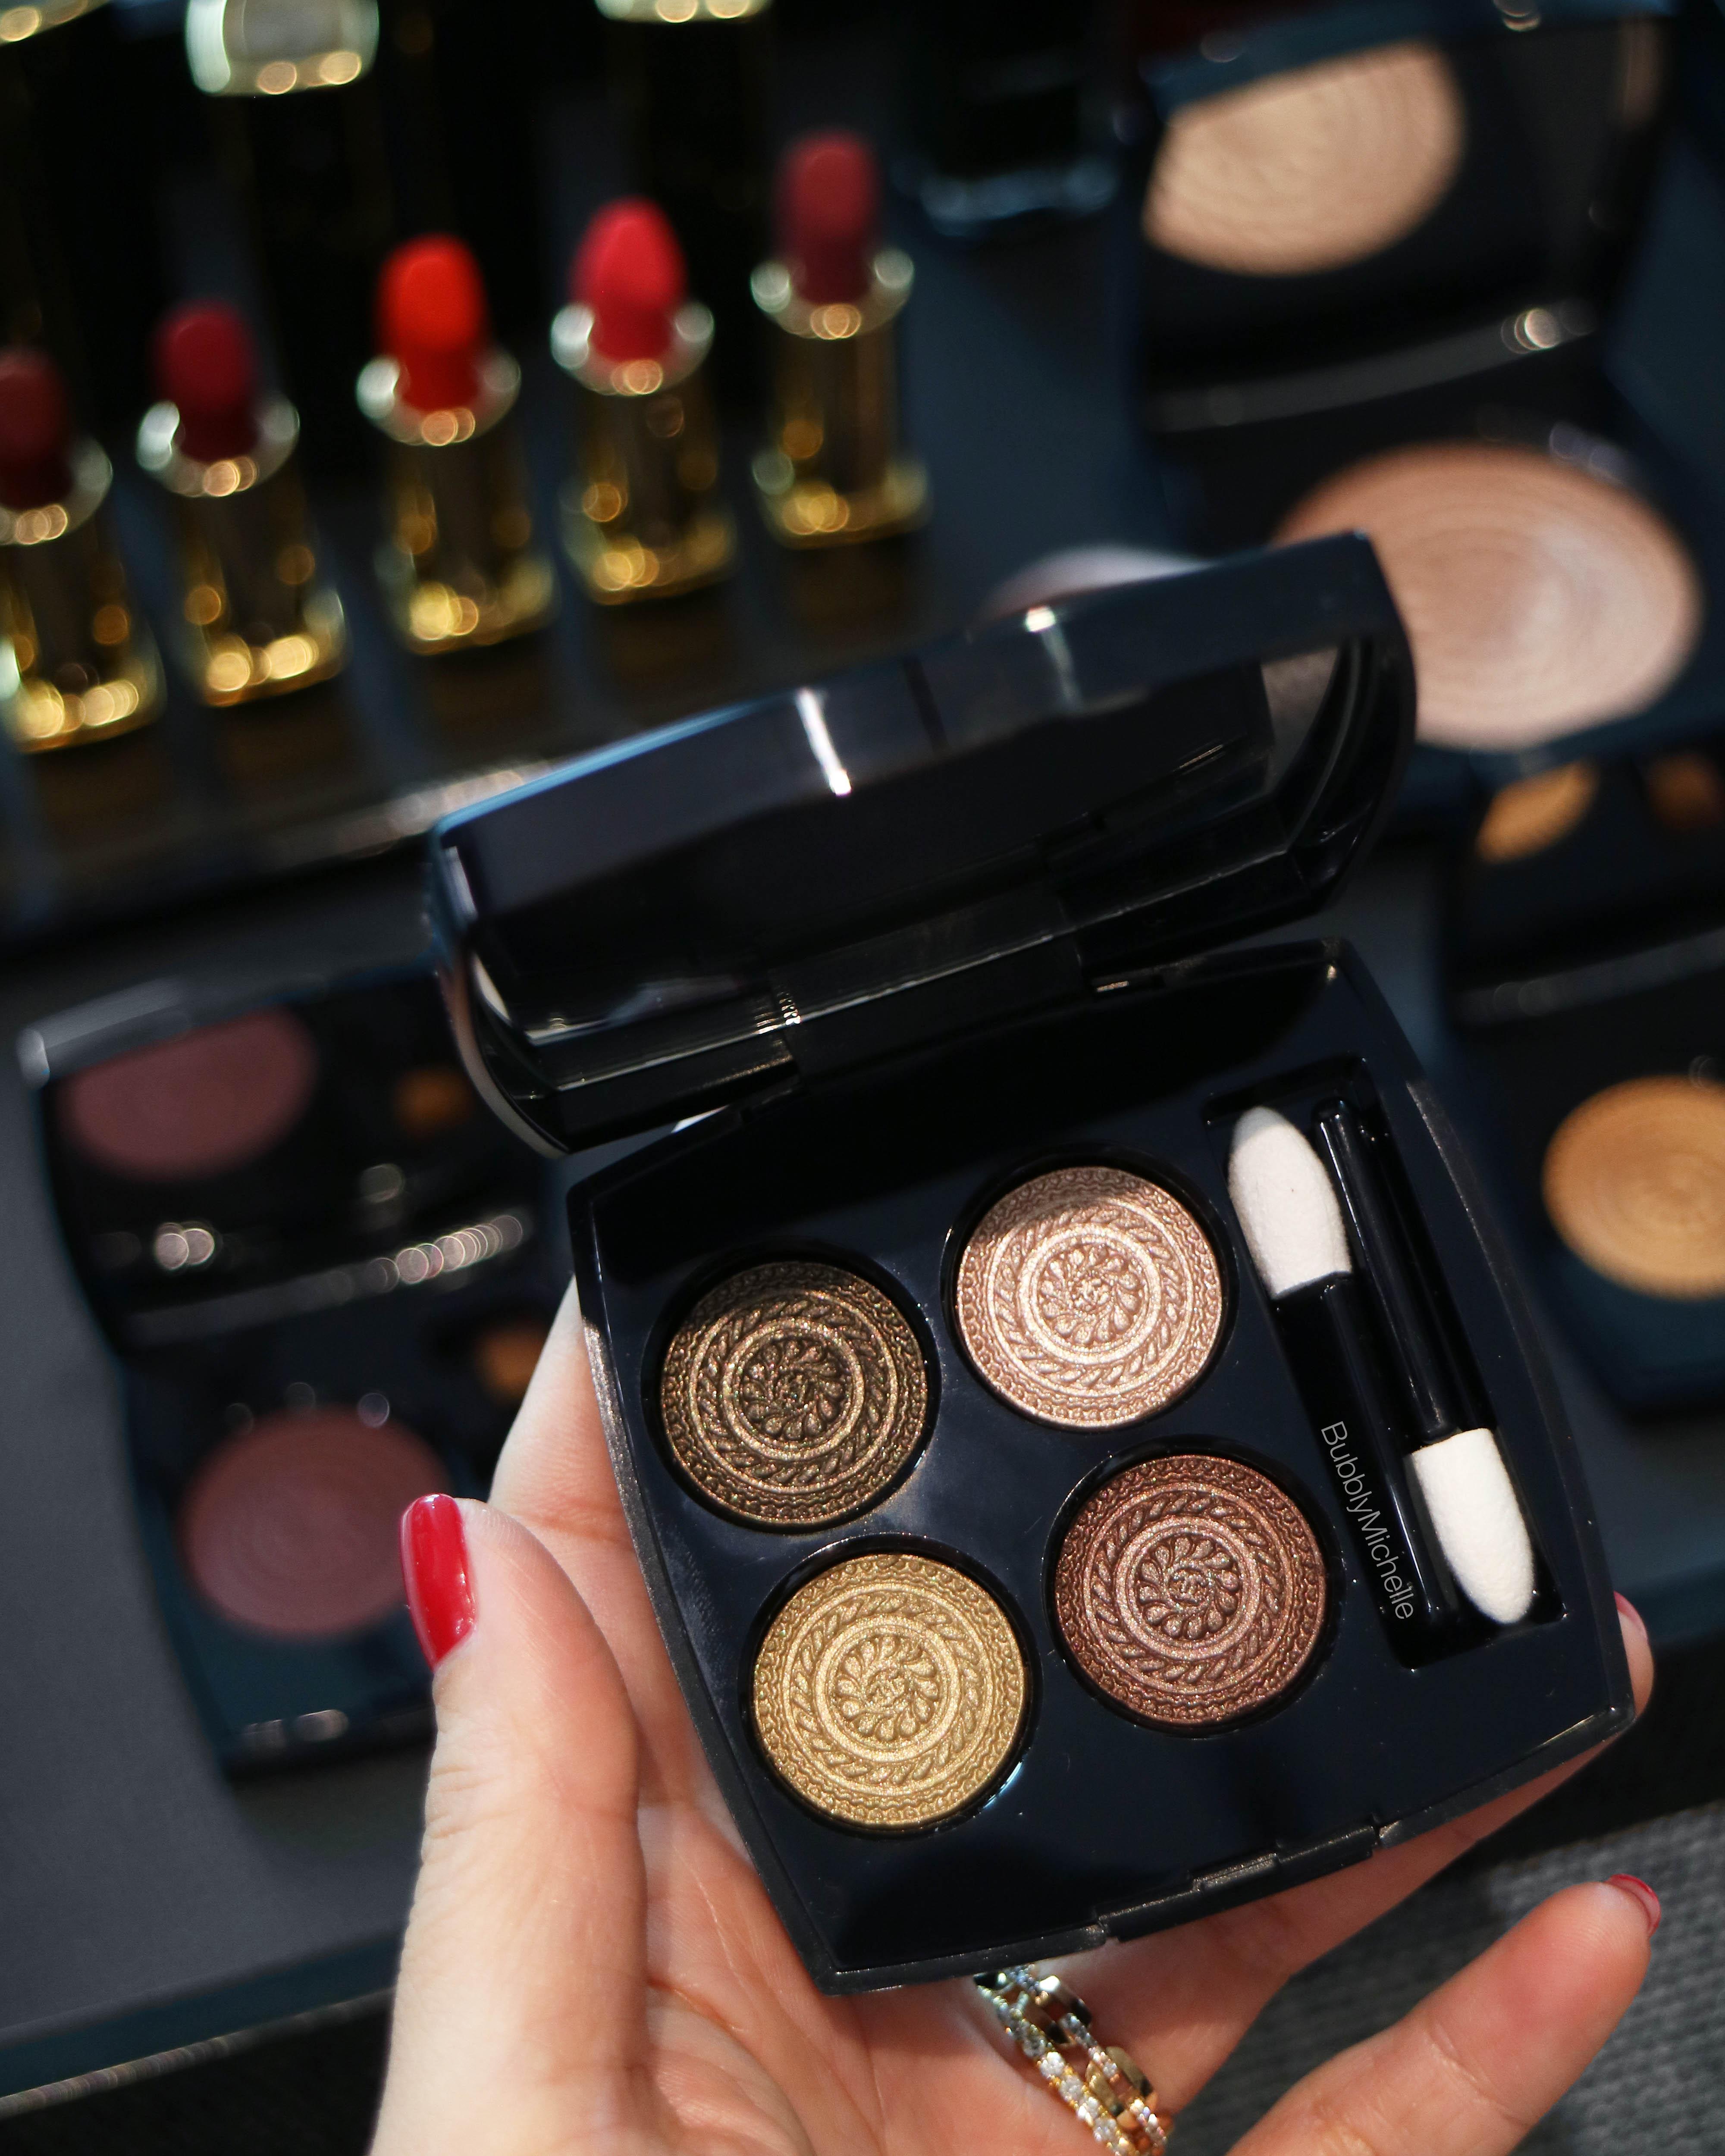 Chanel holiday 2019 makeup